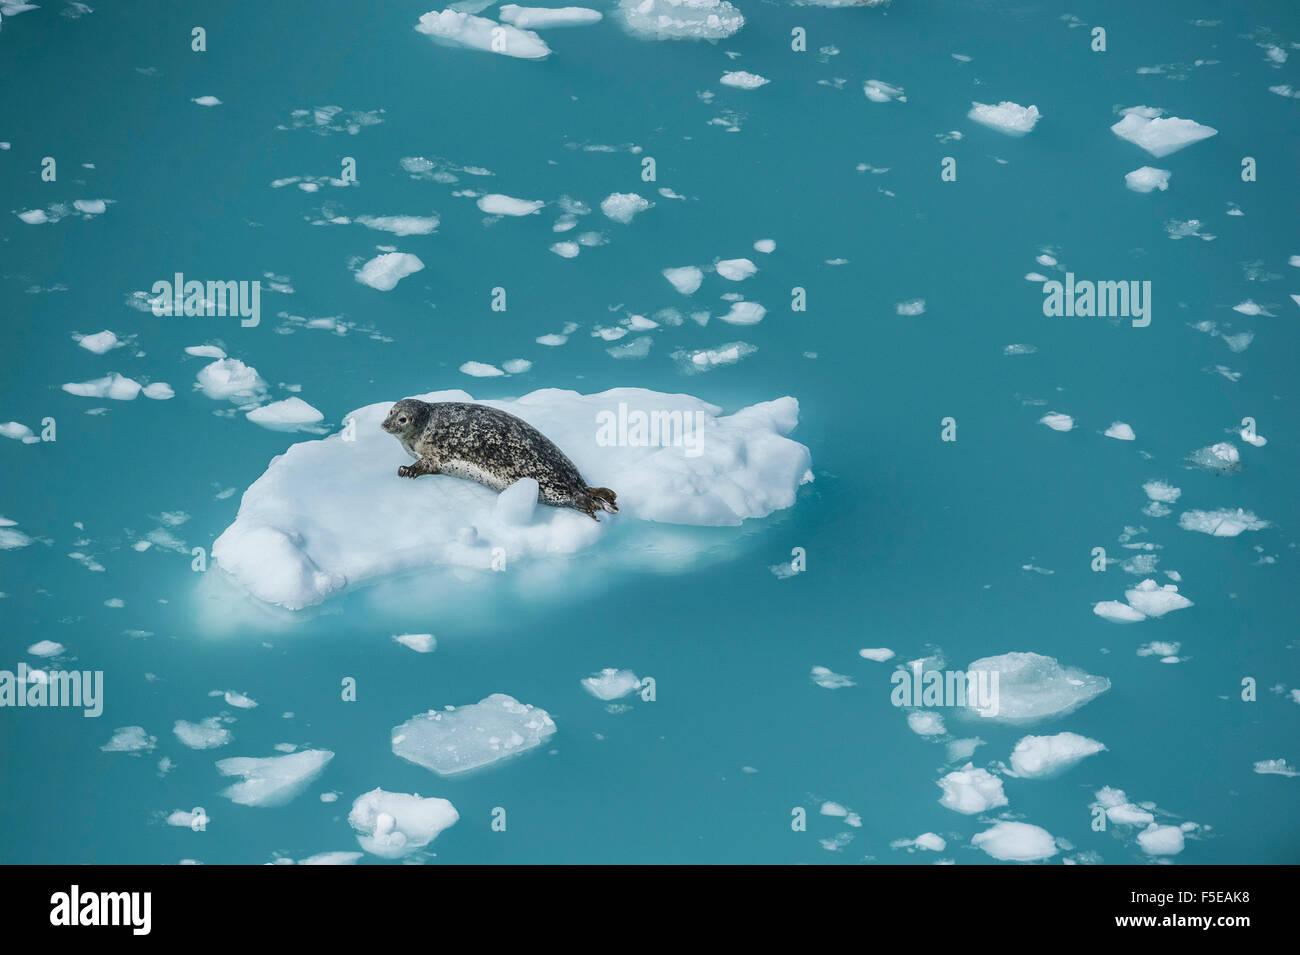 Harbour seal on ice floe, Glacier Bay, Alaska, United States of America, North America - Stock Image